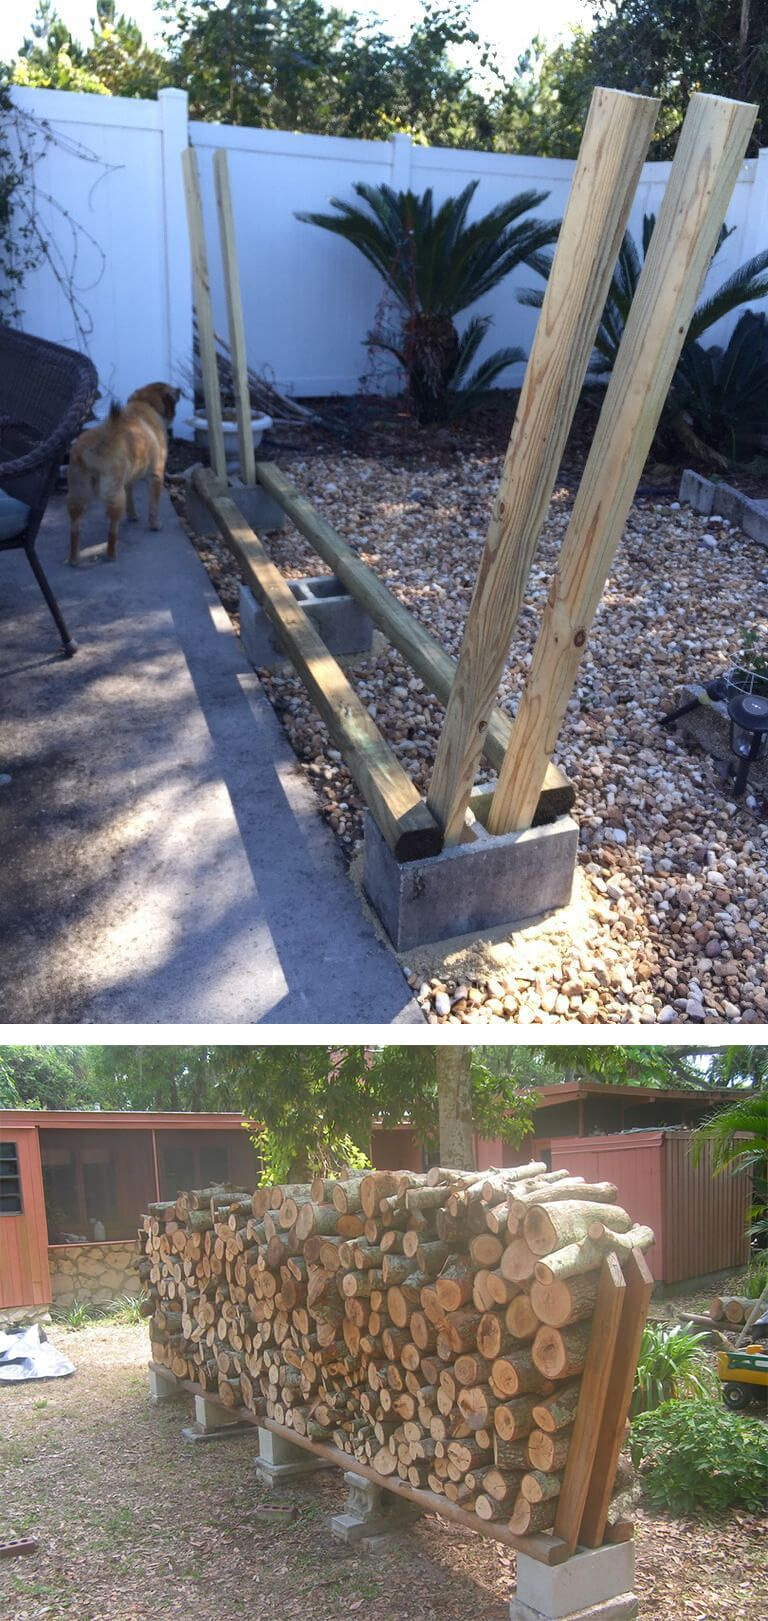 15 Simple Diy Outdoor Firewood Rack Ideas To Keep Your Wood Dry Outdoor Firewood Rack Firewood Storage Outdoor Firewood Rack